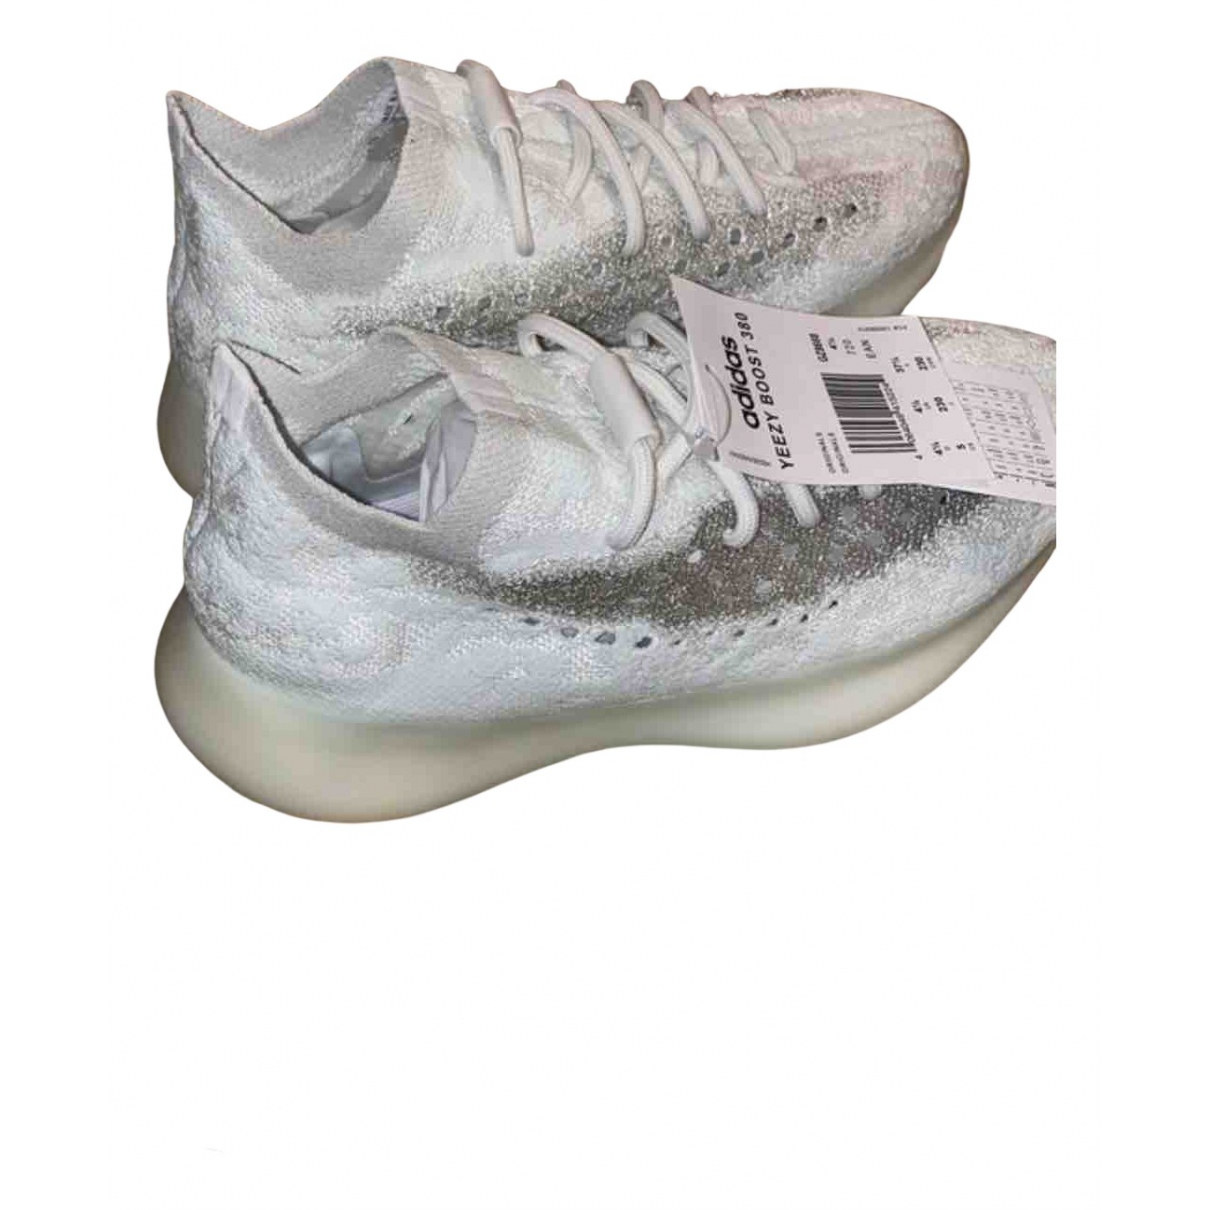 Yeezy X Adidas - Baskets Boost 380 pour femme en toile - blanc